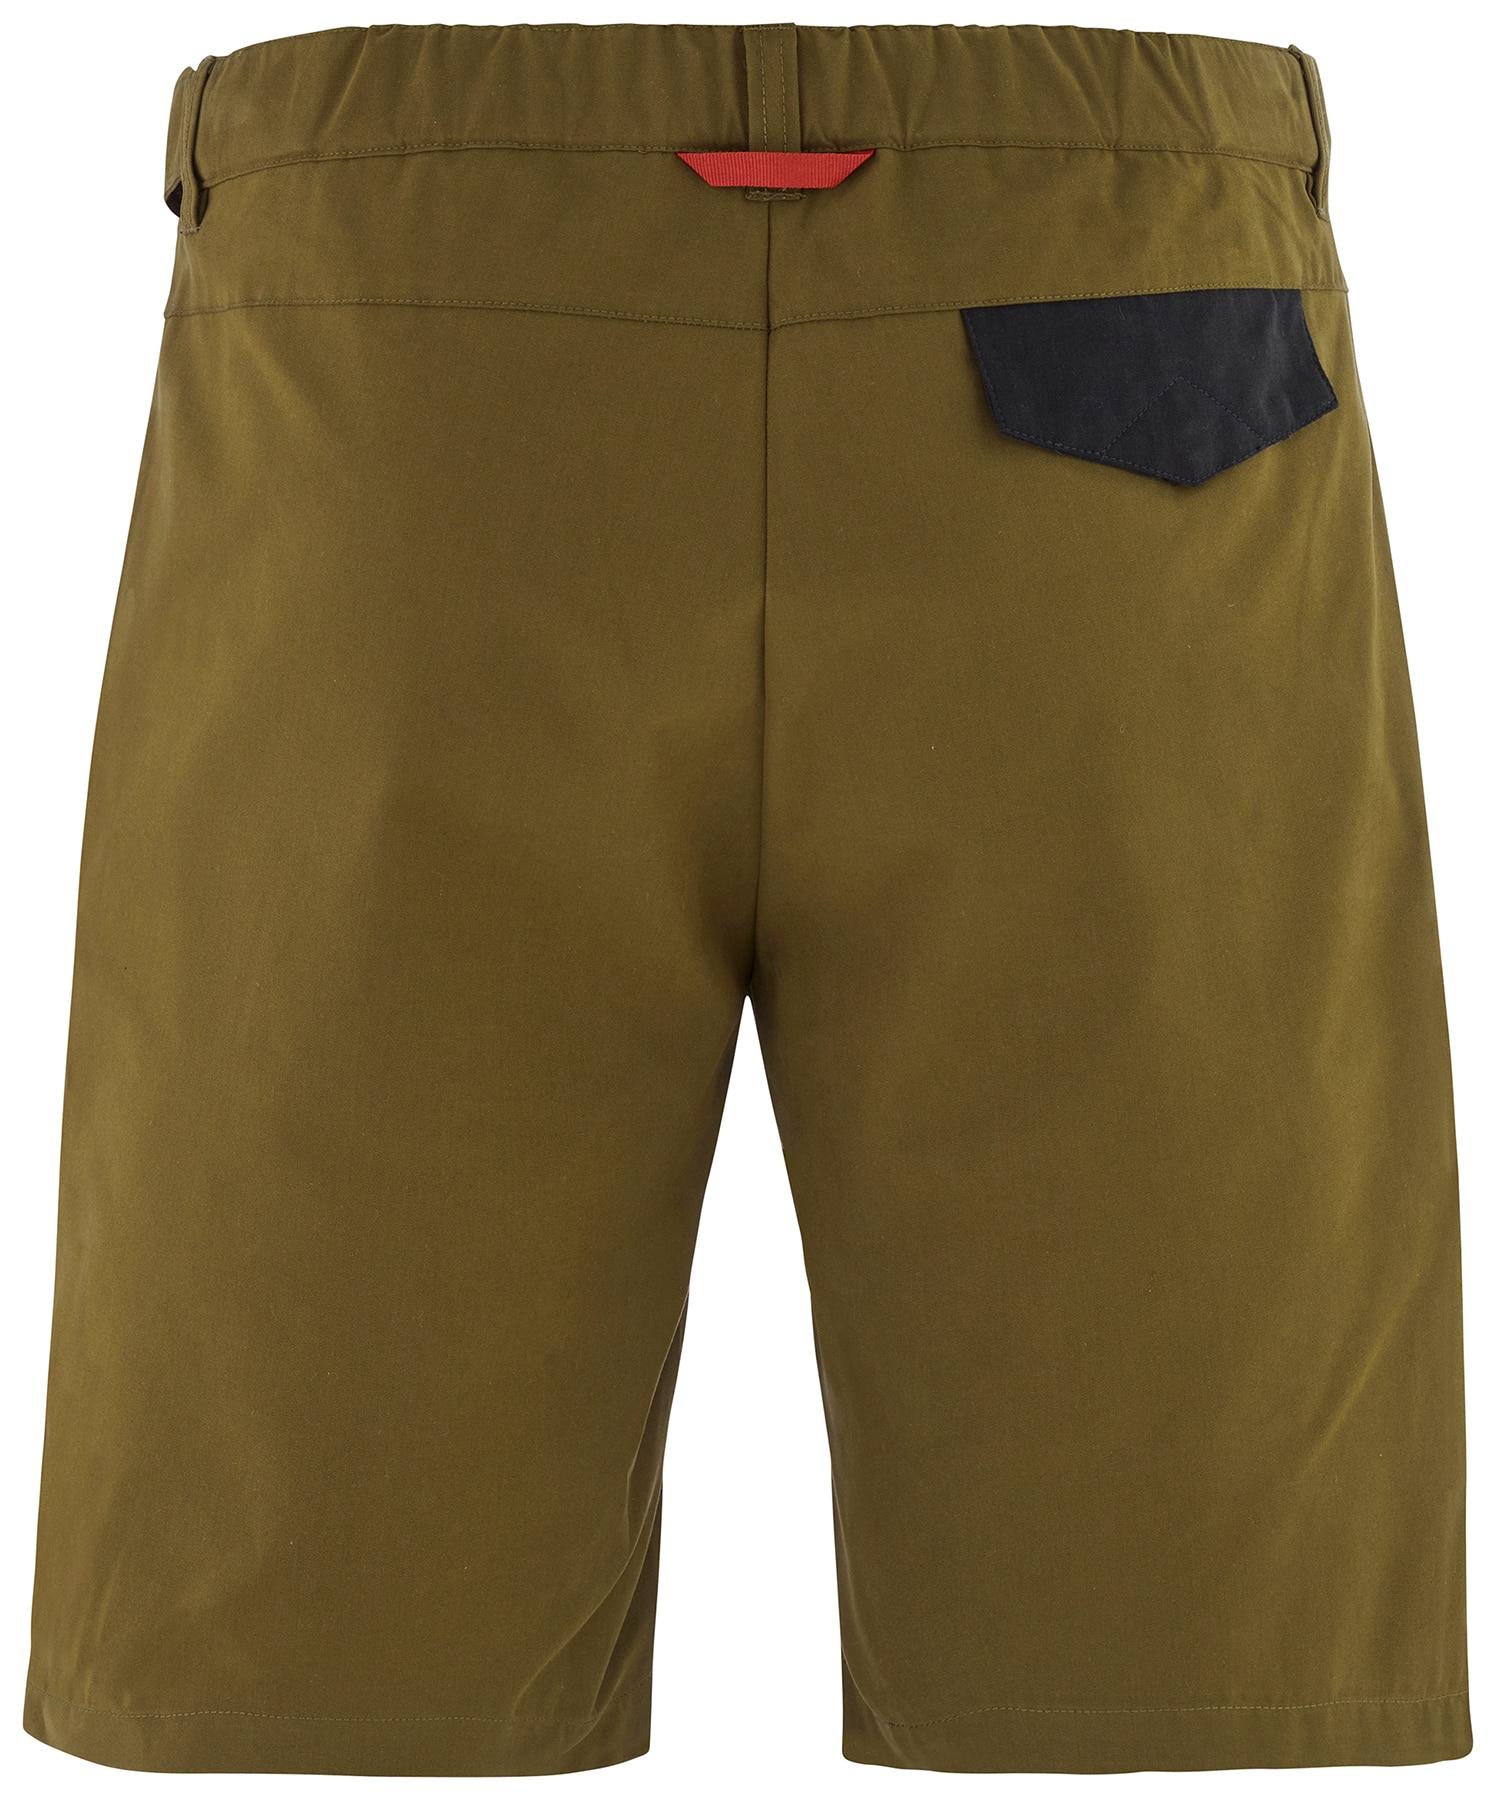 Bula Swell Trekking shorts